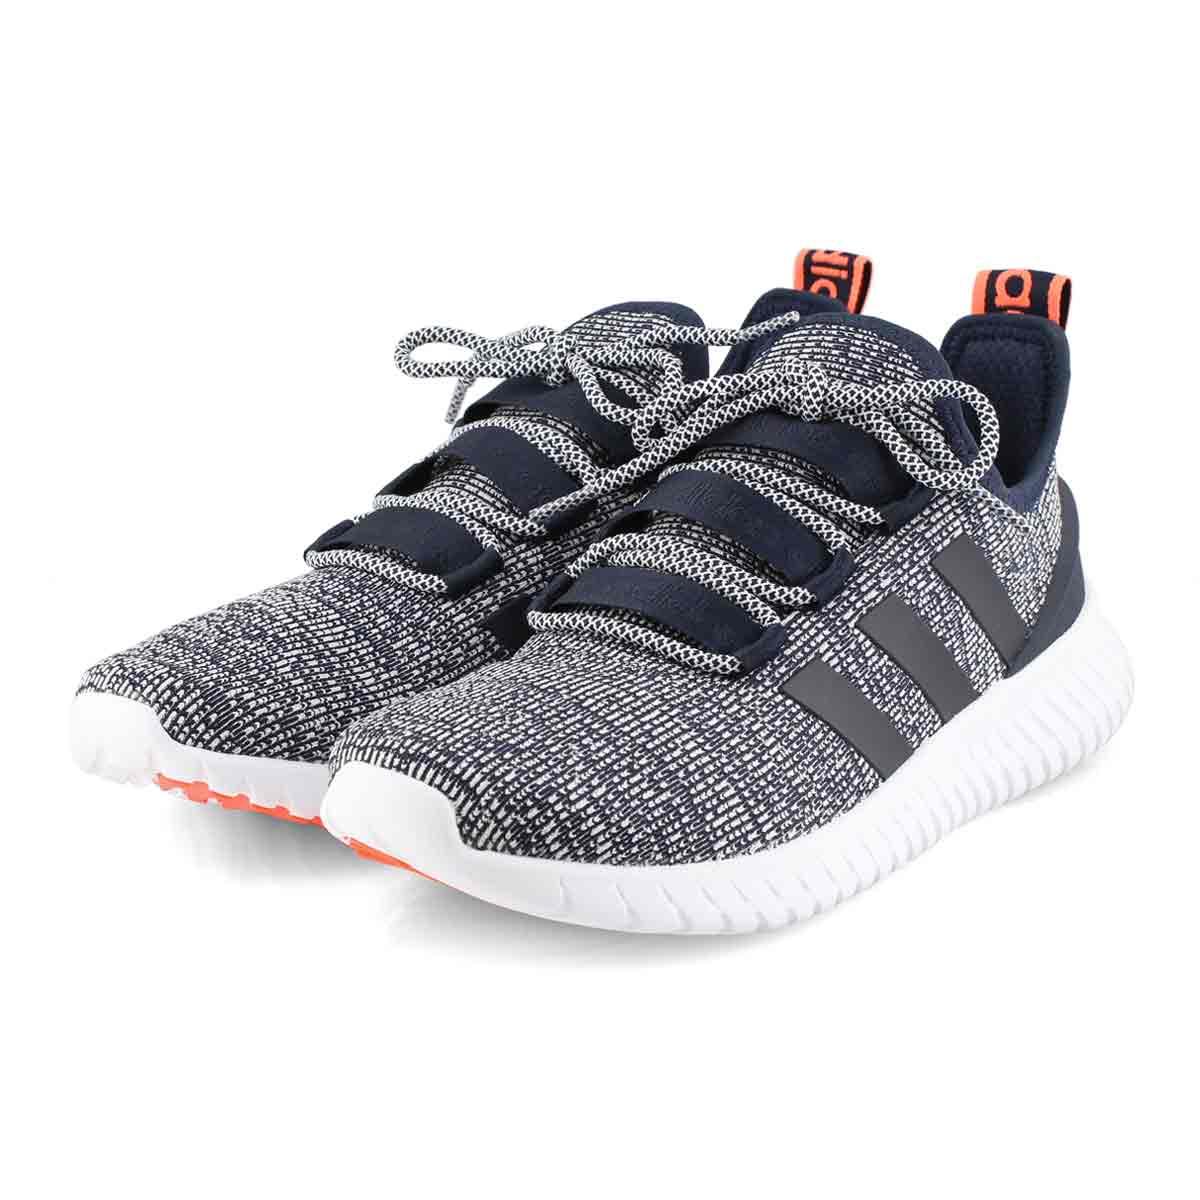 Mns Kaptir ink/wht slip on sneaker